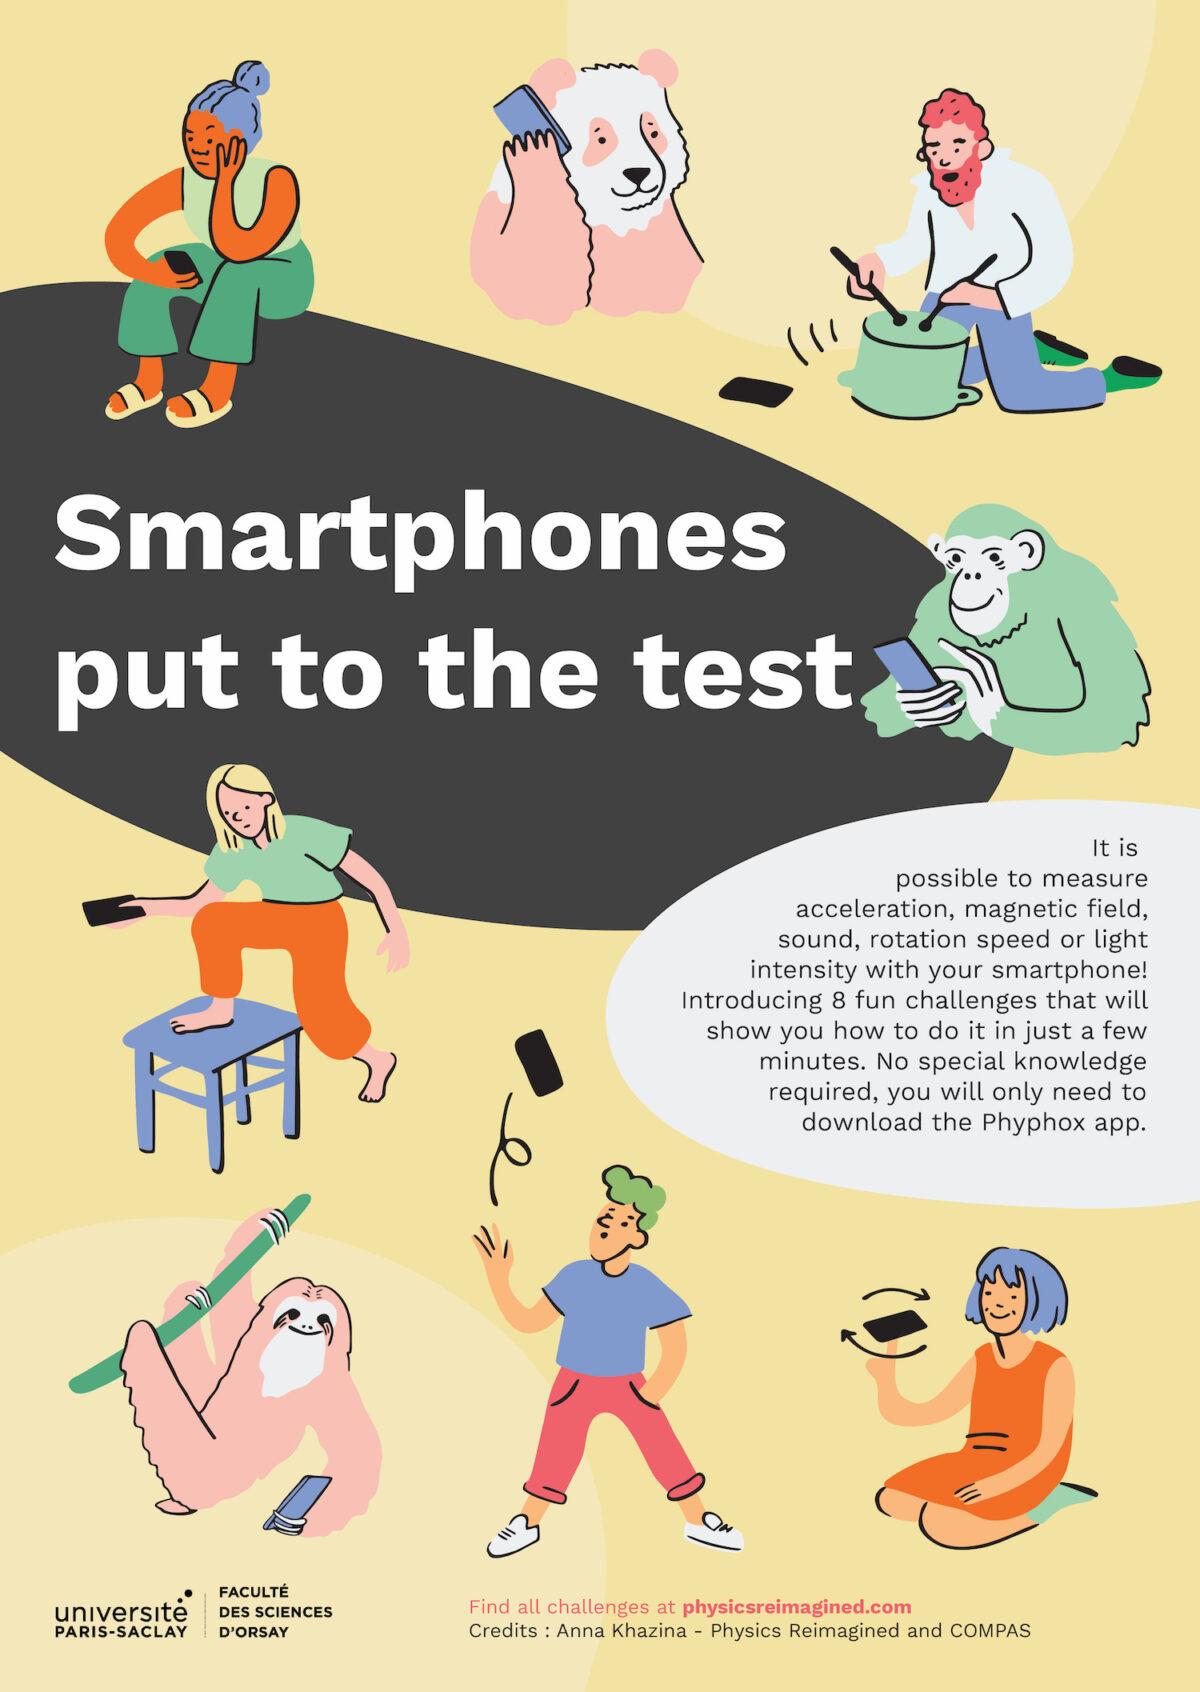 Smartphones put to the test